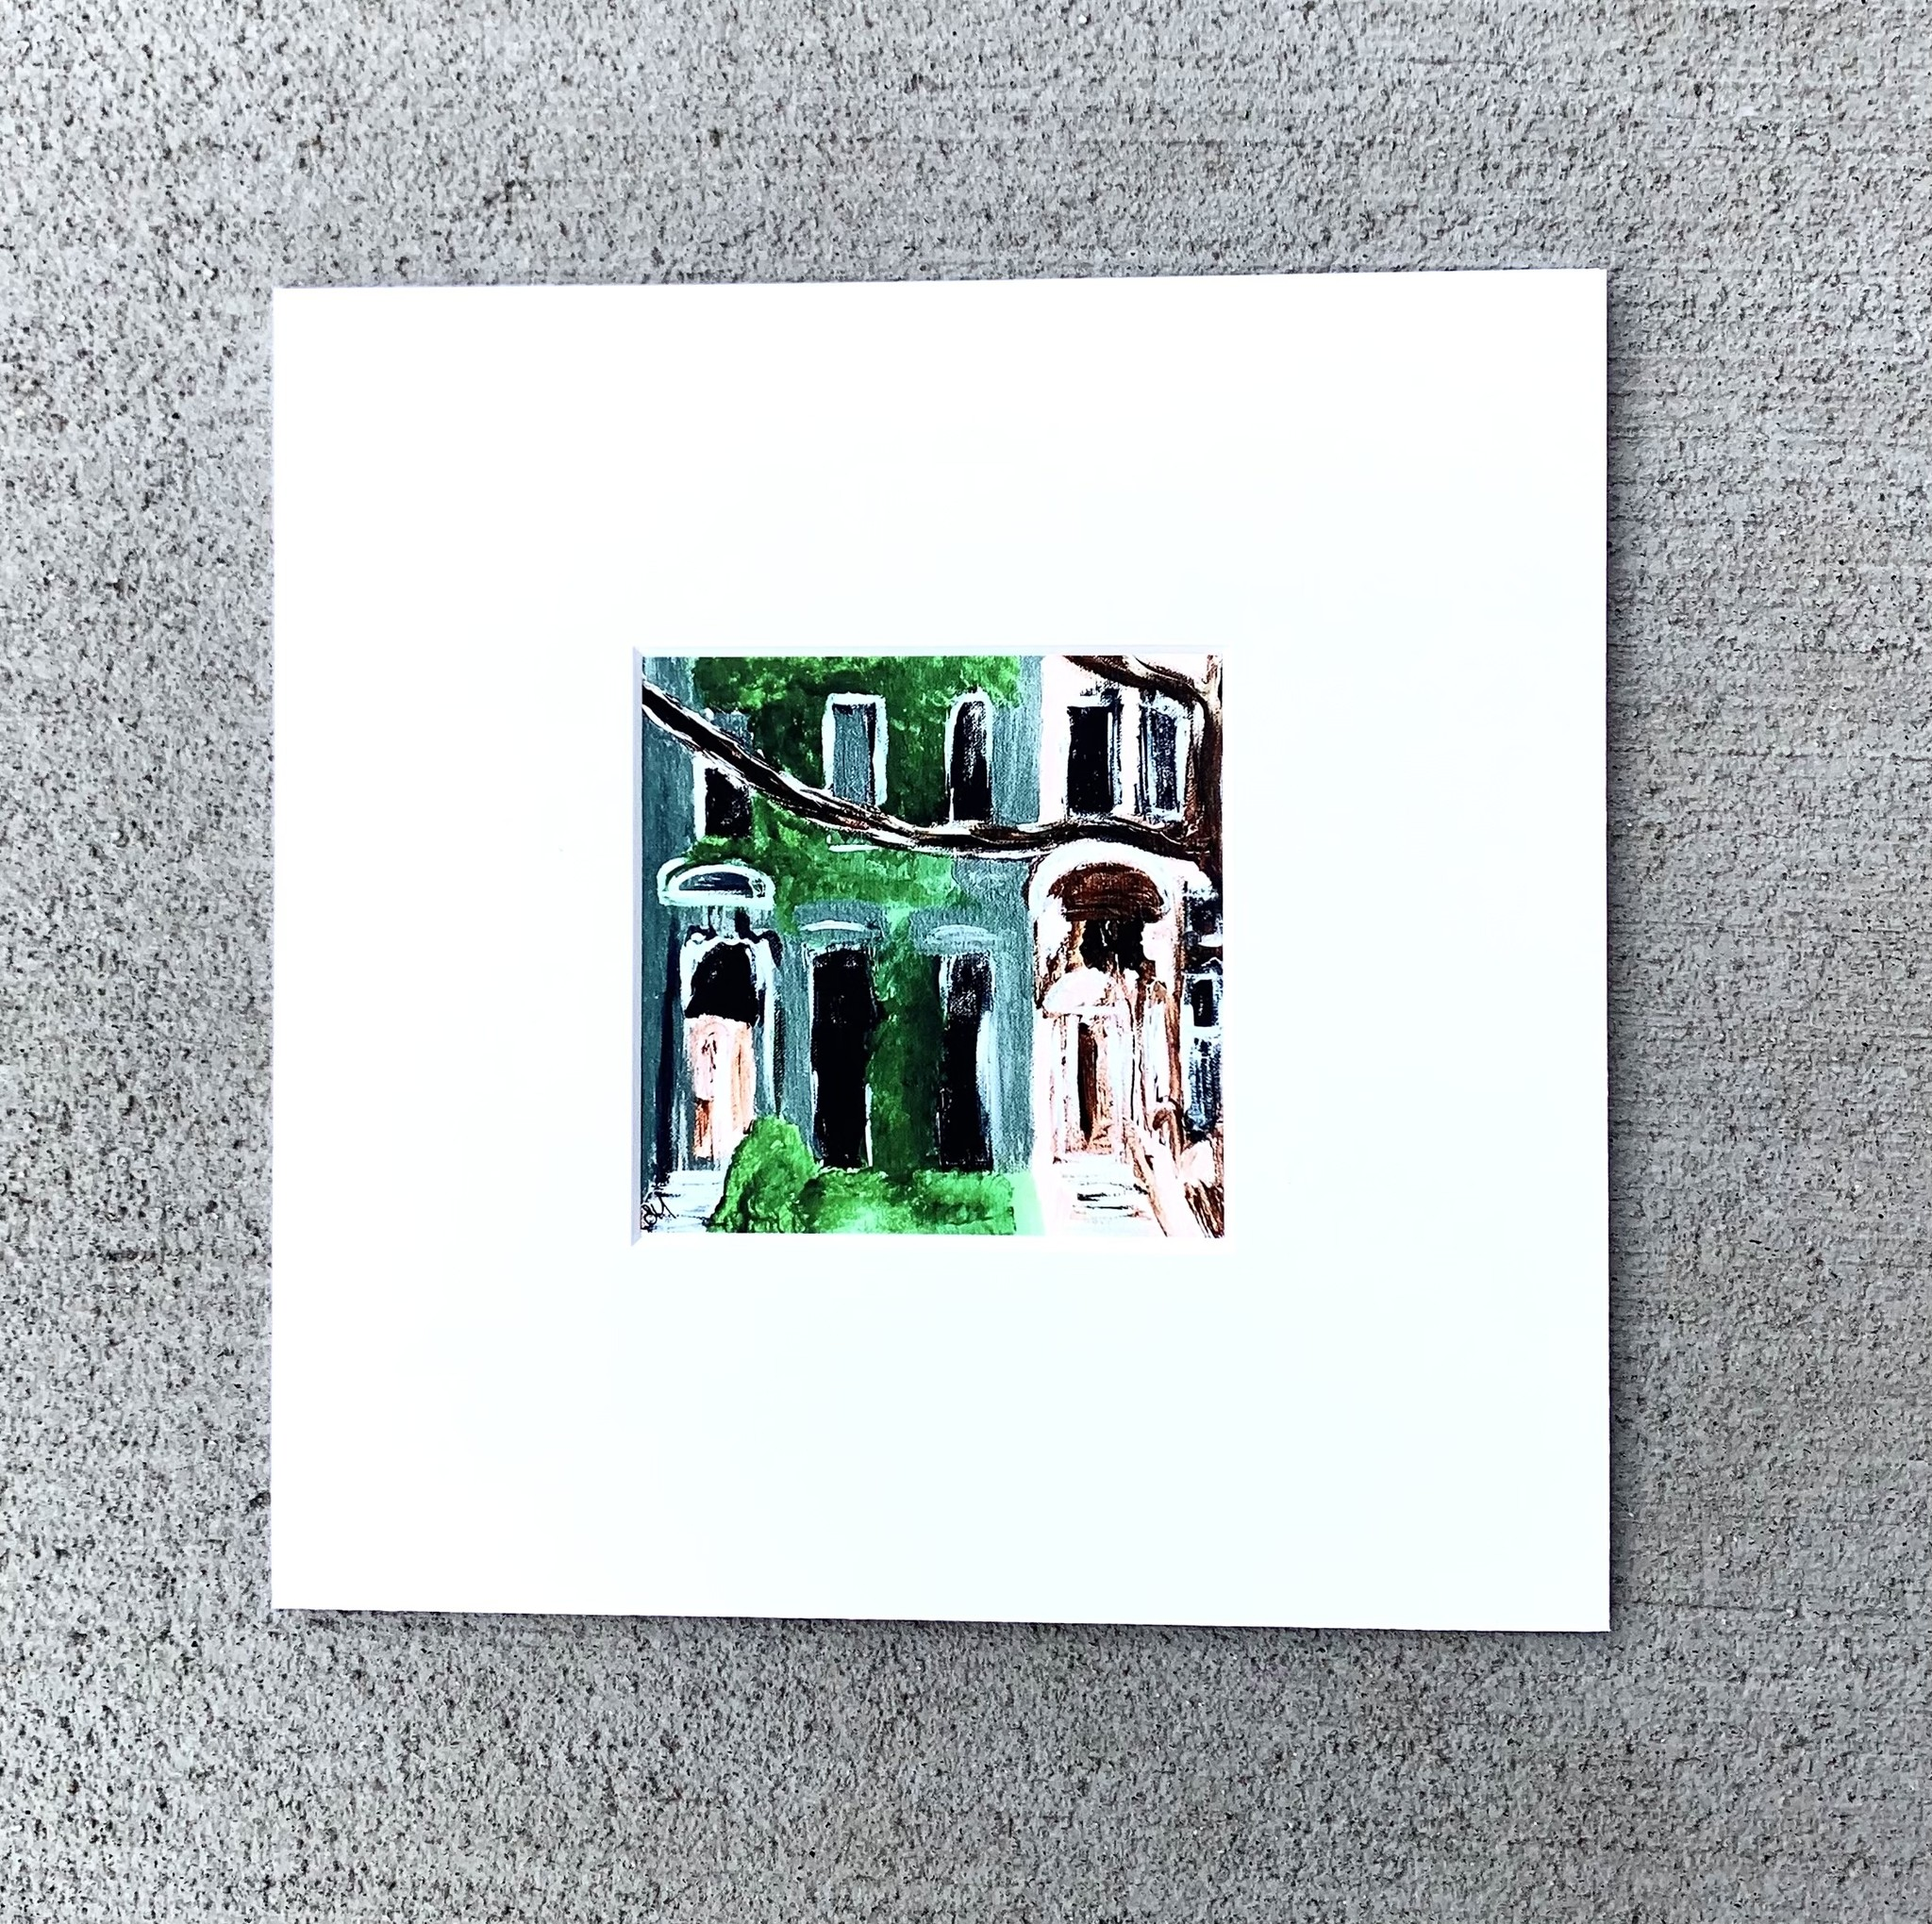 Shannon Harfosh Brownstone Painting by Shannon Harfosh - Small